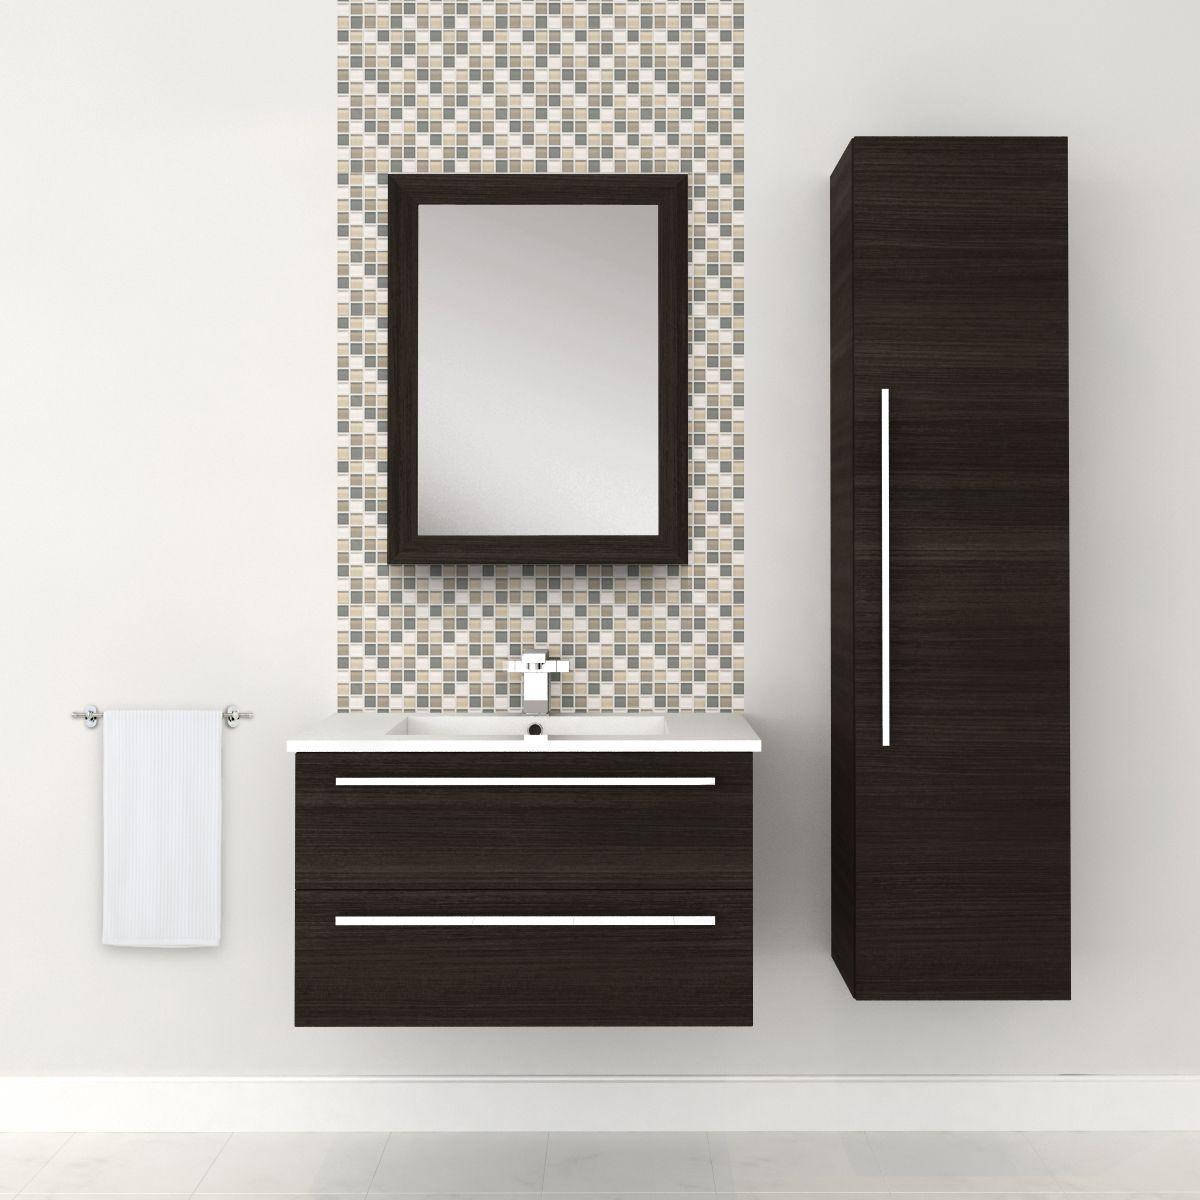 Cutler Kitchen Bath Fv Medcab Silhouette Collection Medicine Cabinet Atg Stores Single Bathroom Vanity Bathroom Design Bathroom Vanity